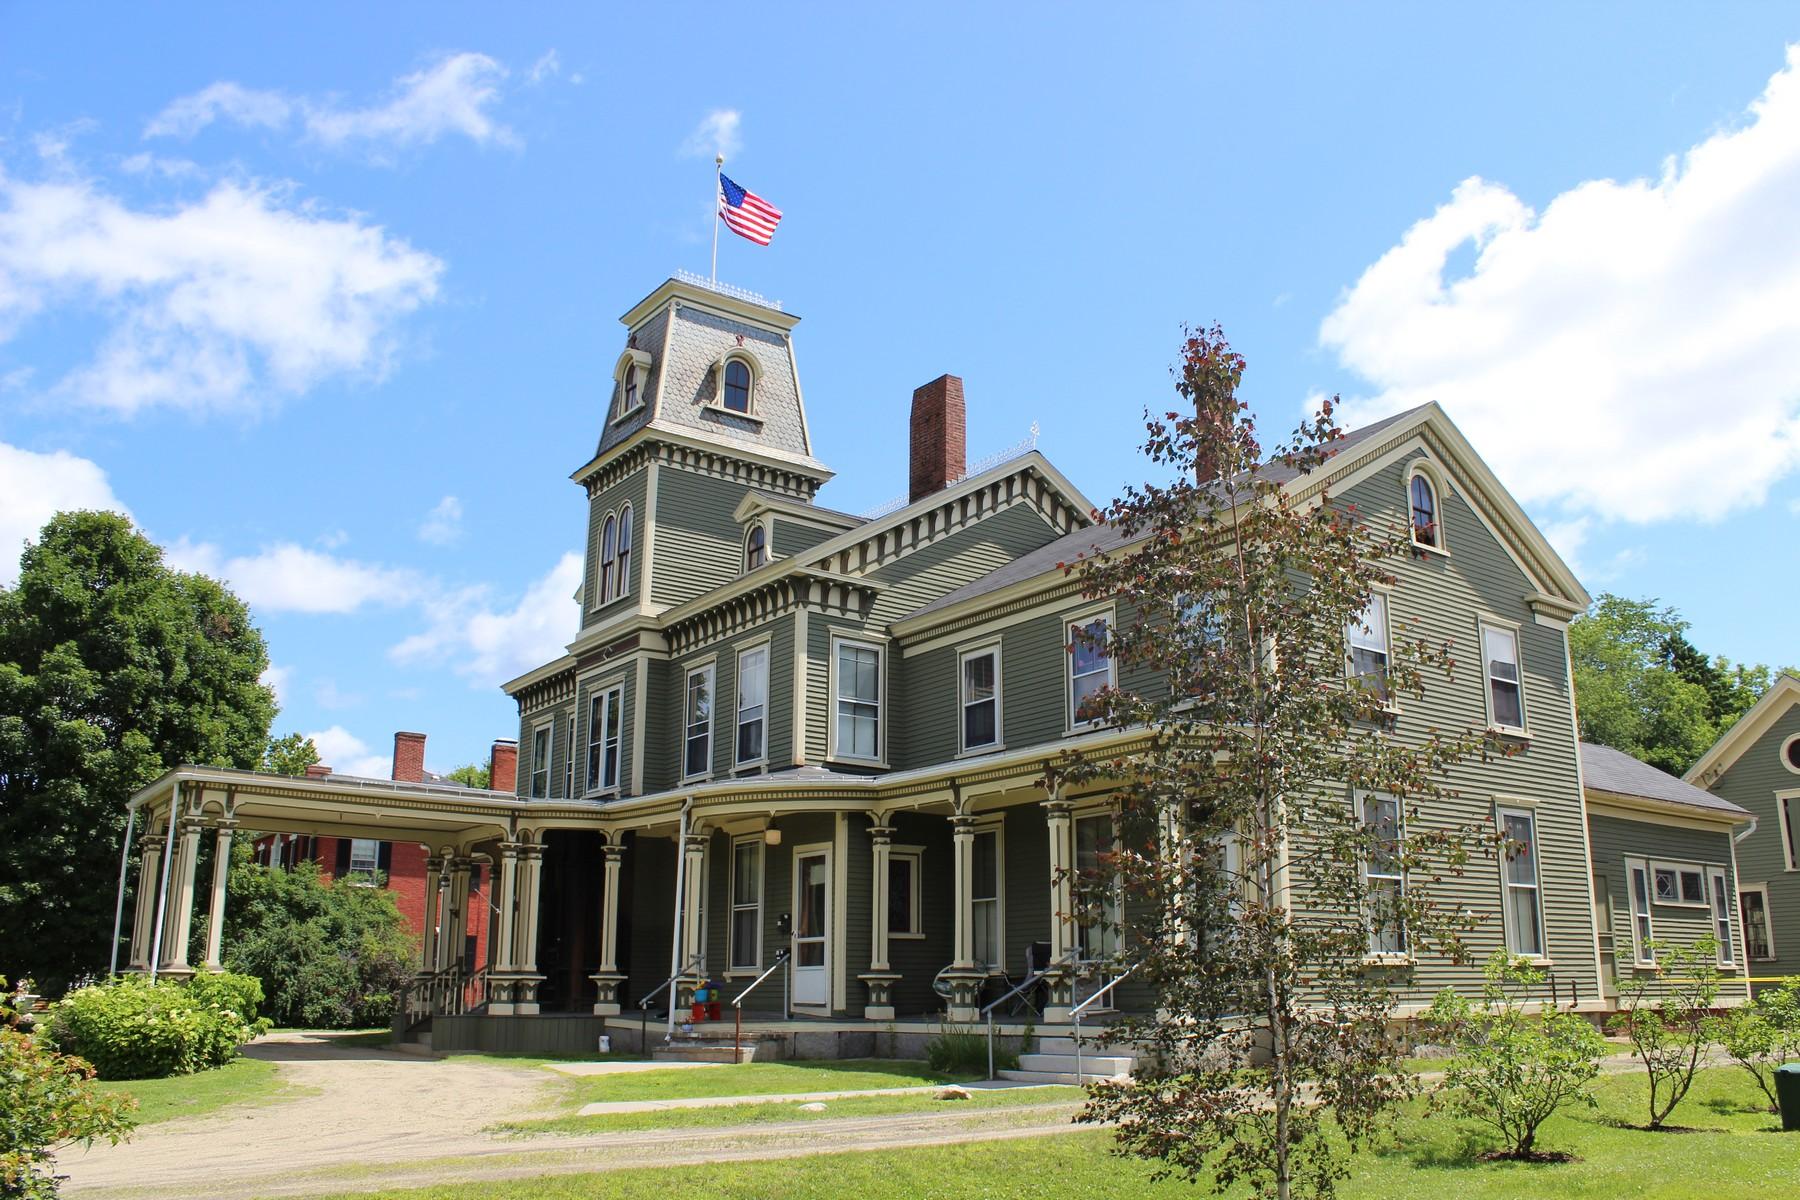 Villa per Vendita alle ore Idlewood 1496 Main St St. Johnsbury, Vermont, 05819 Stati Uniti